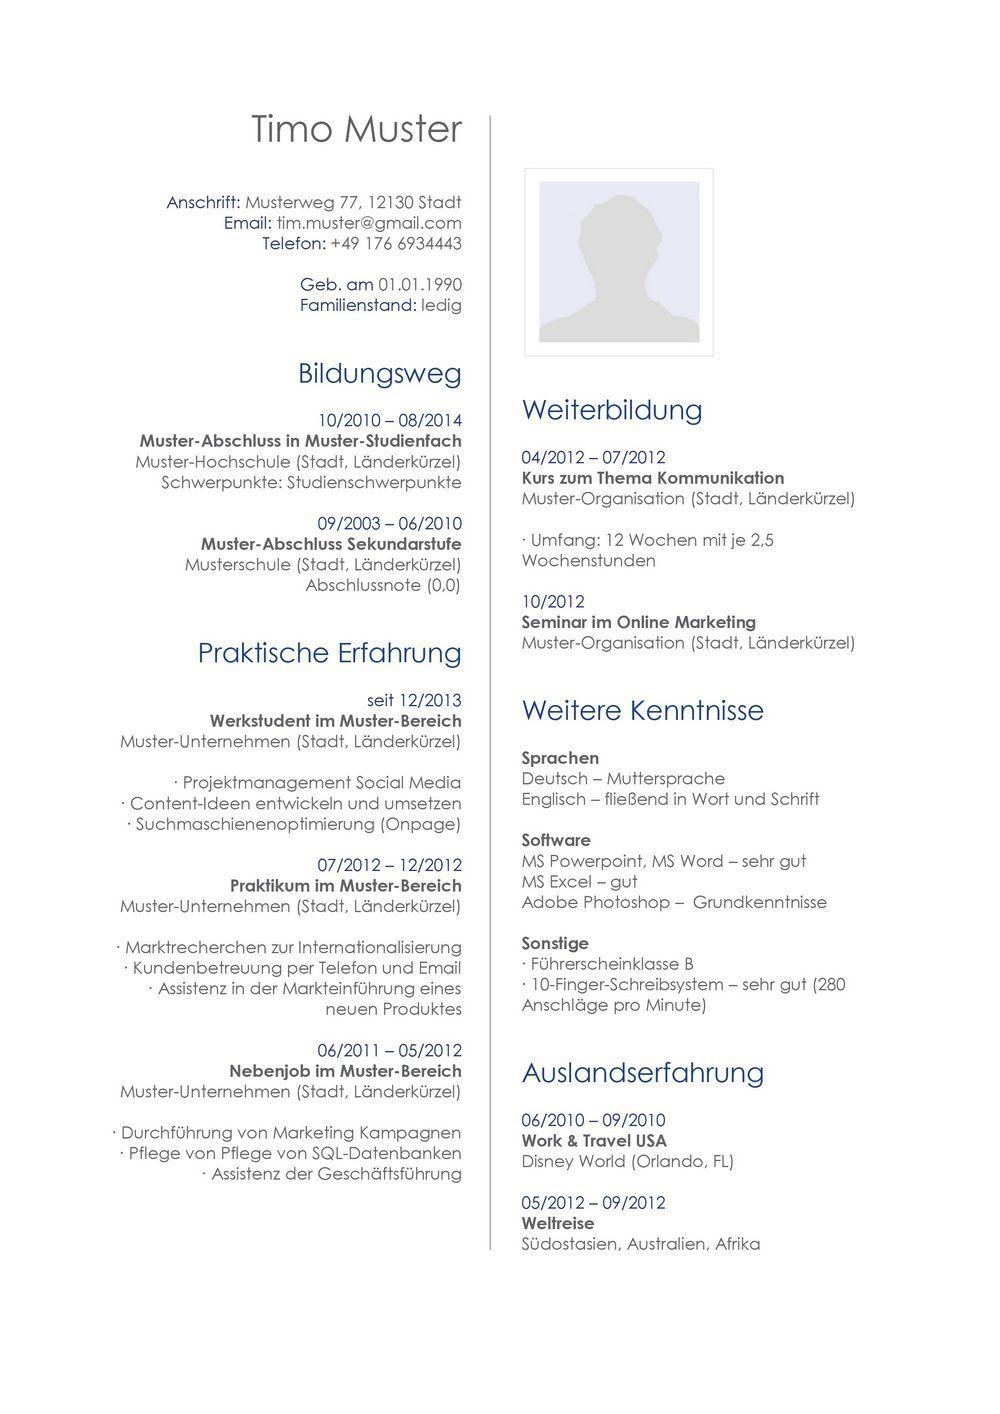 Lebenslauf Muster Vorlage 33 Architekt | Beruf | Pinterest ...